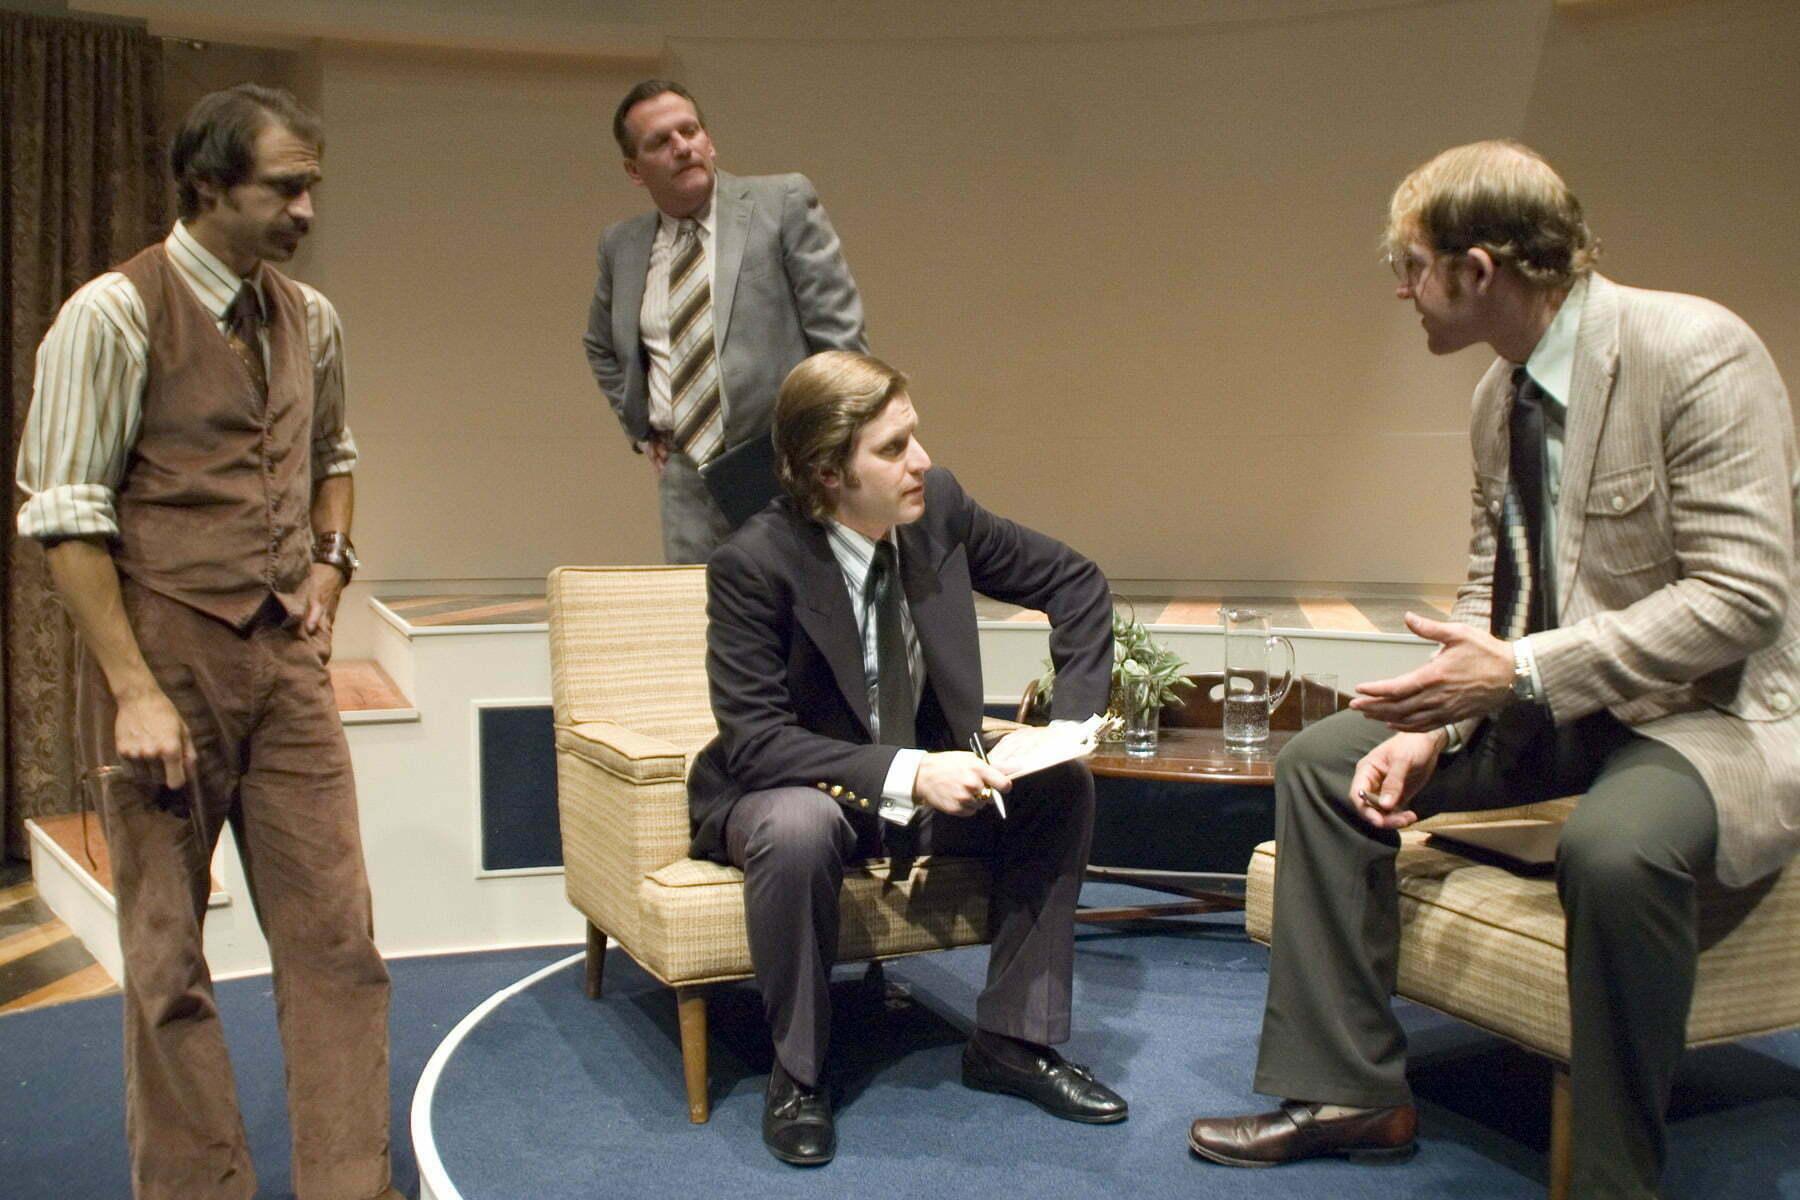 frostnixon theatre reviews